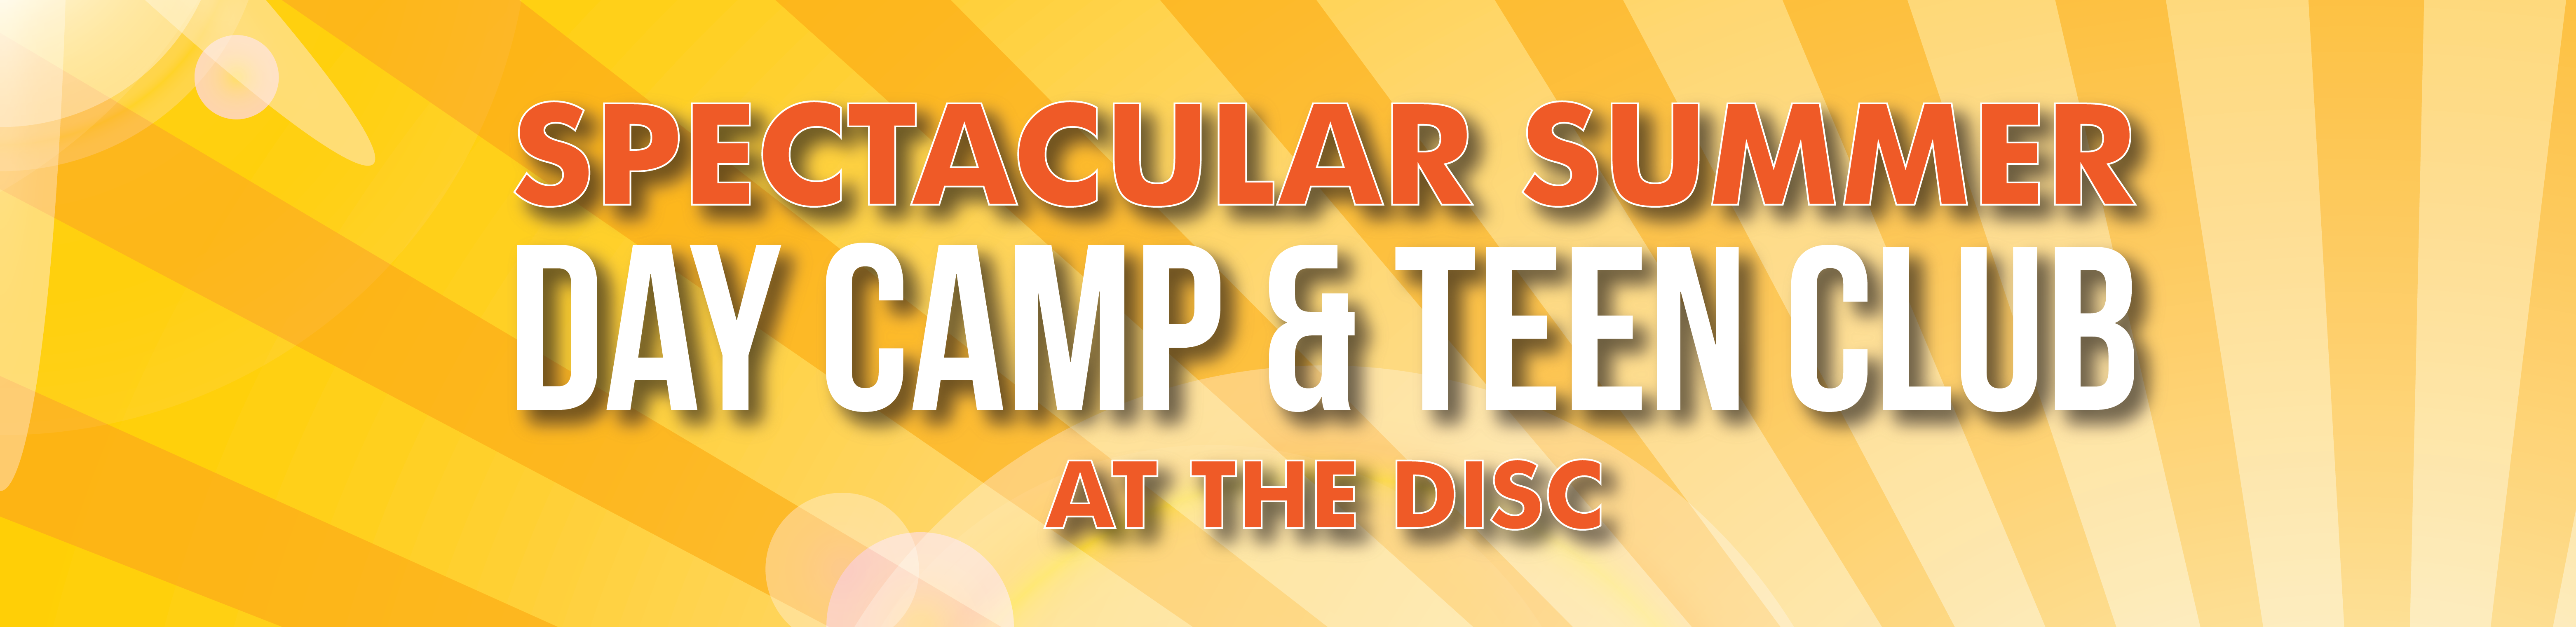 Spectacular Summer Day Camp & Teen Club